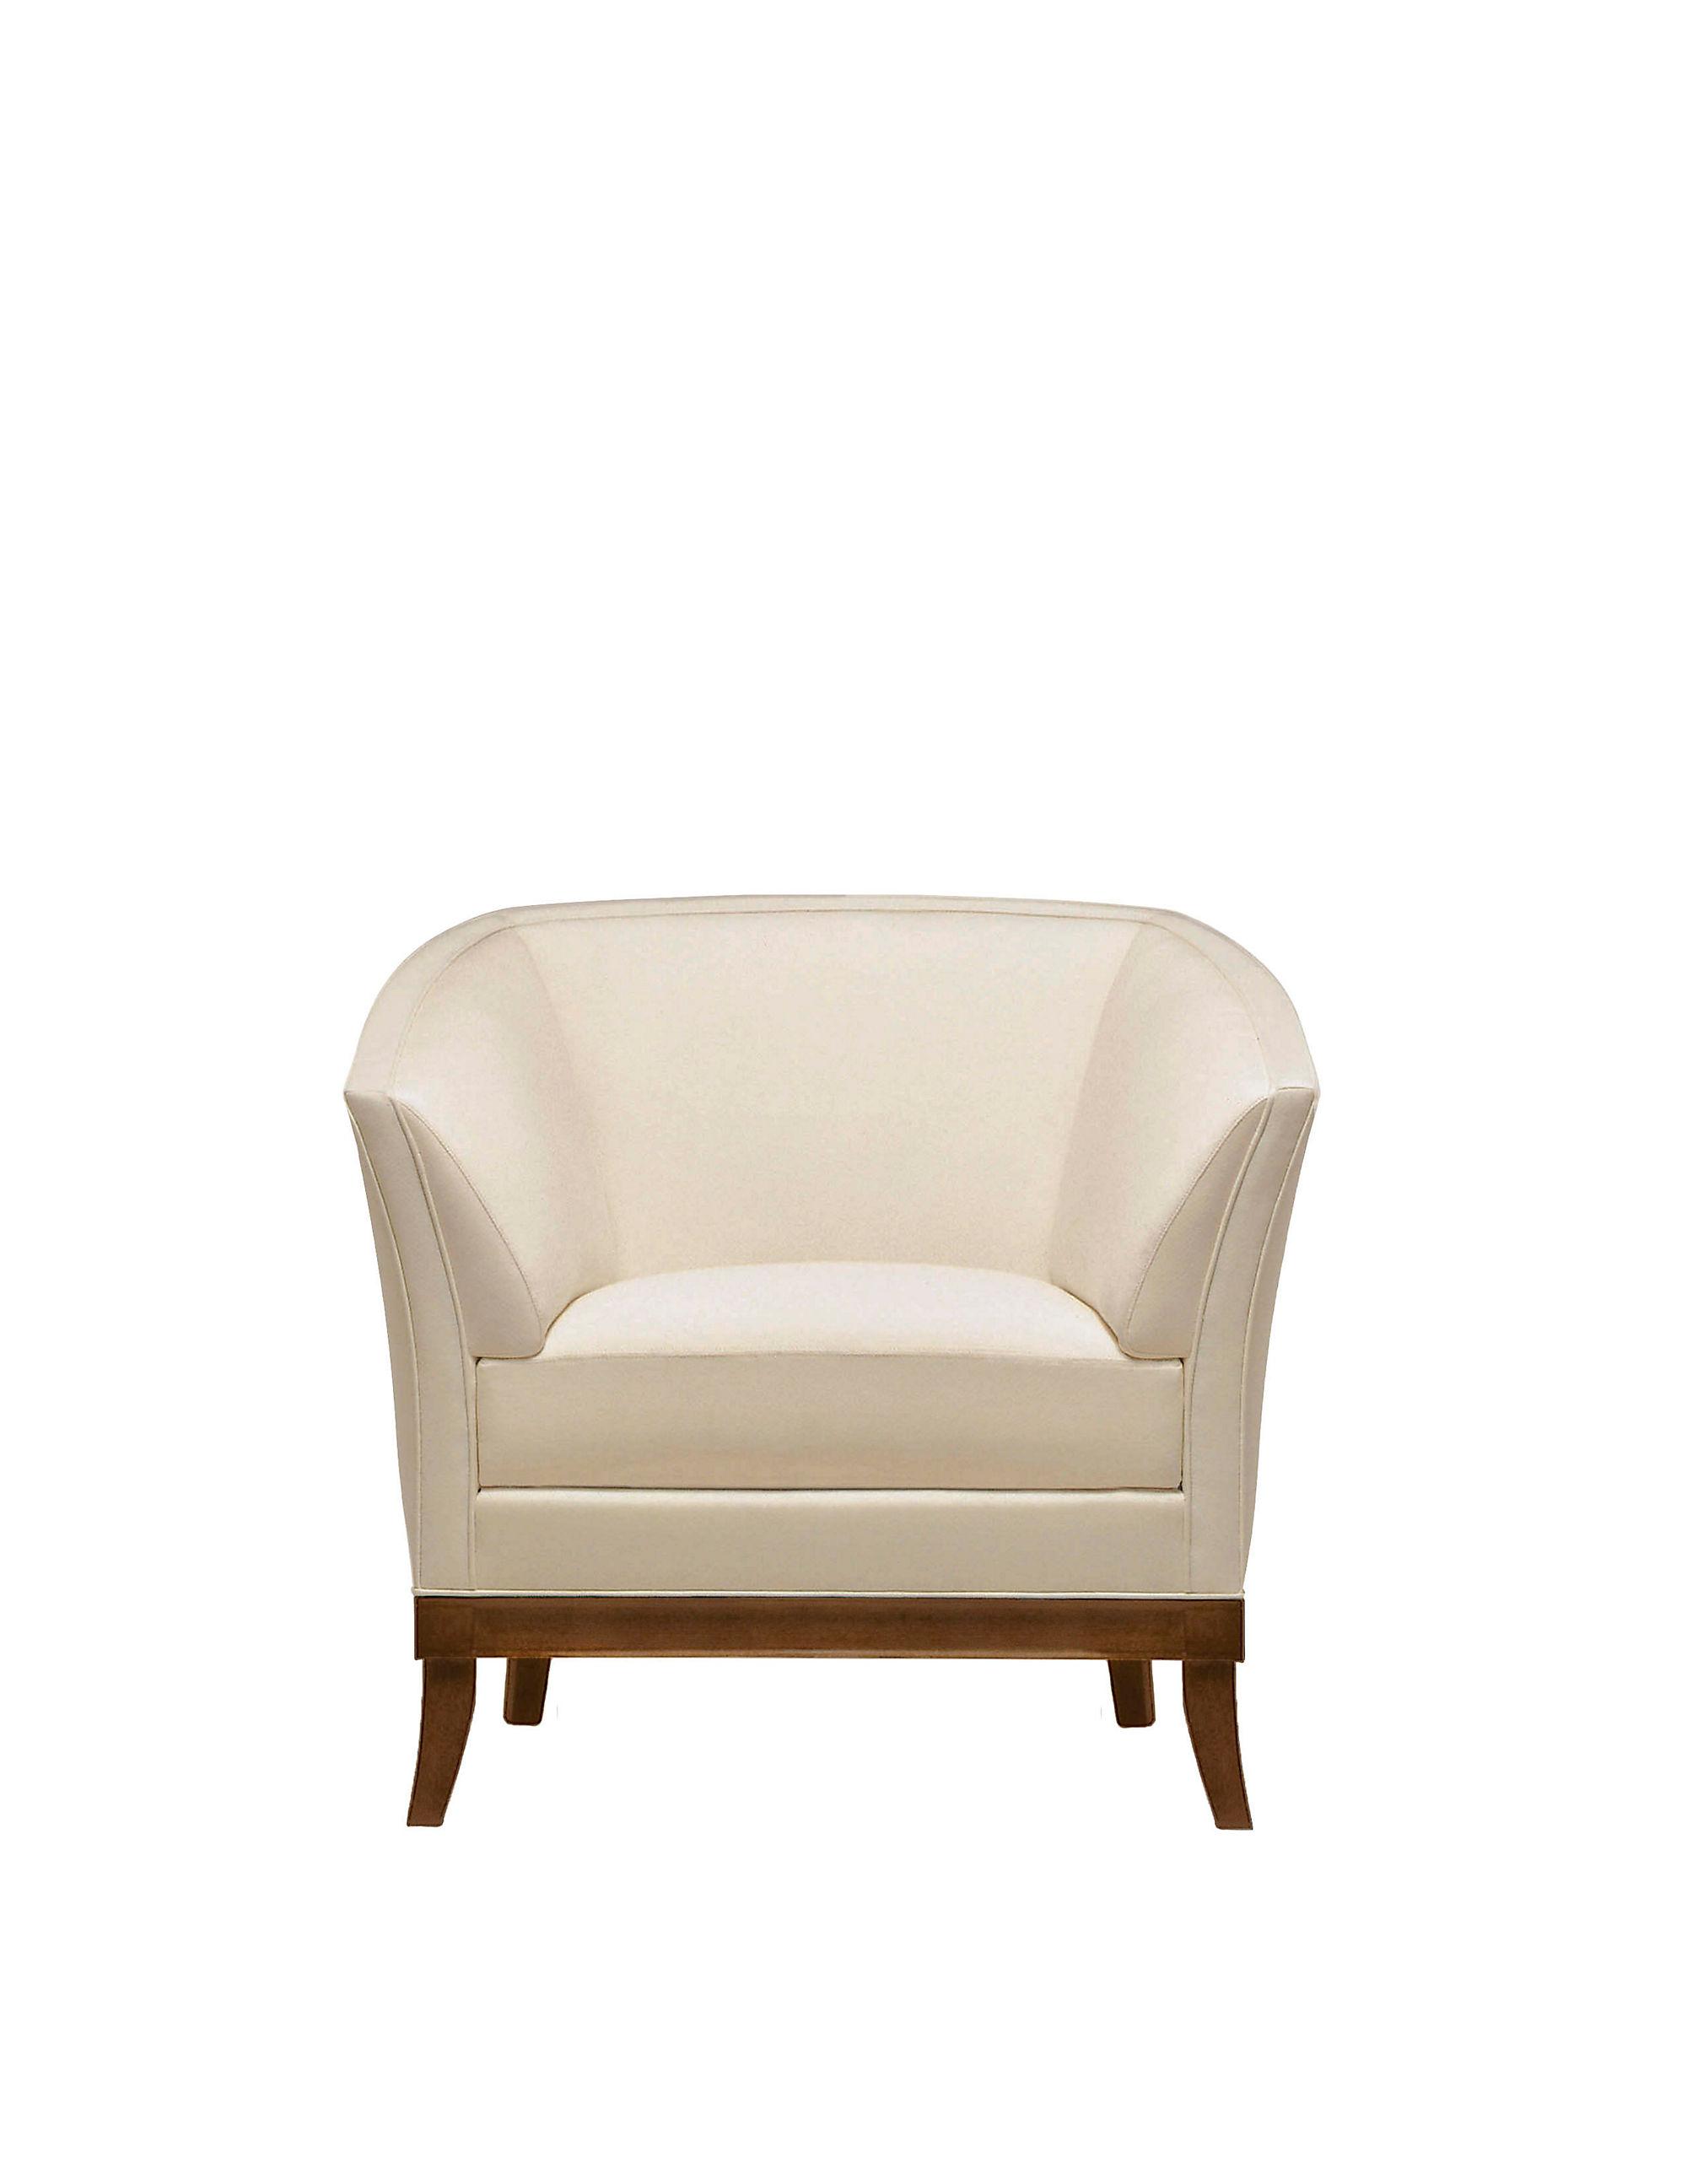 esplanade furniture. hlj309011_esplanade_loungechairs_ma2 esplanade furniture